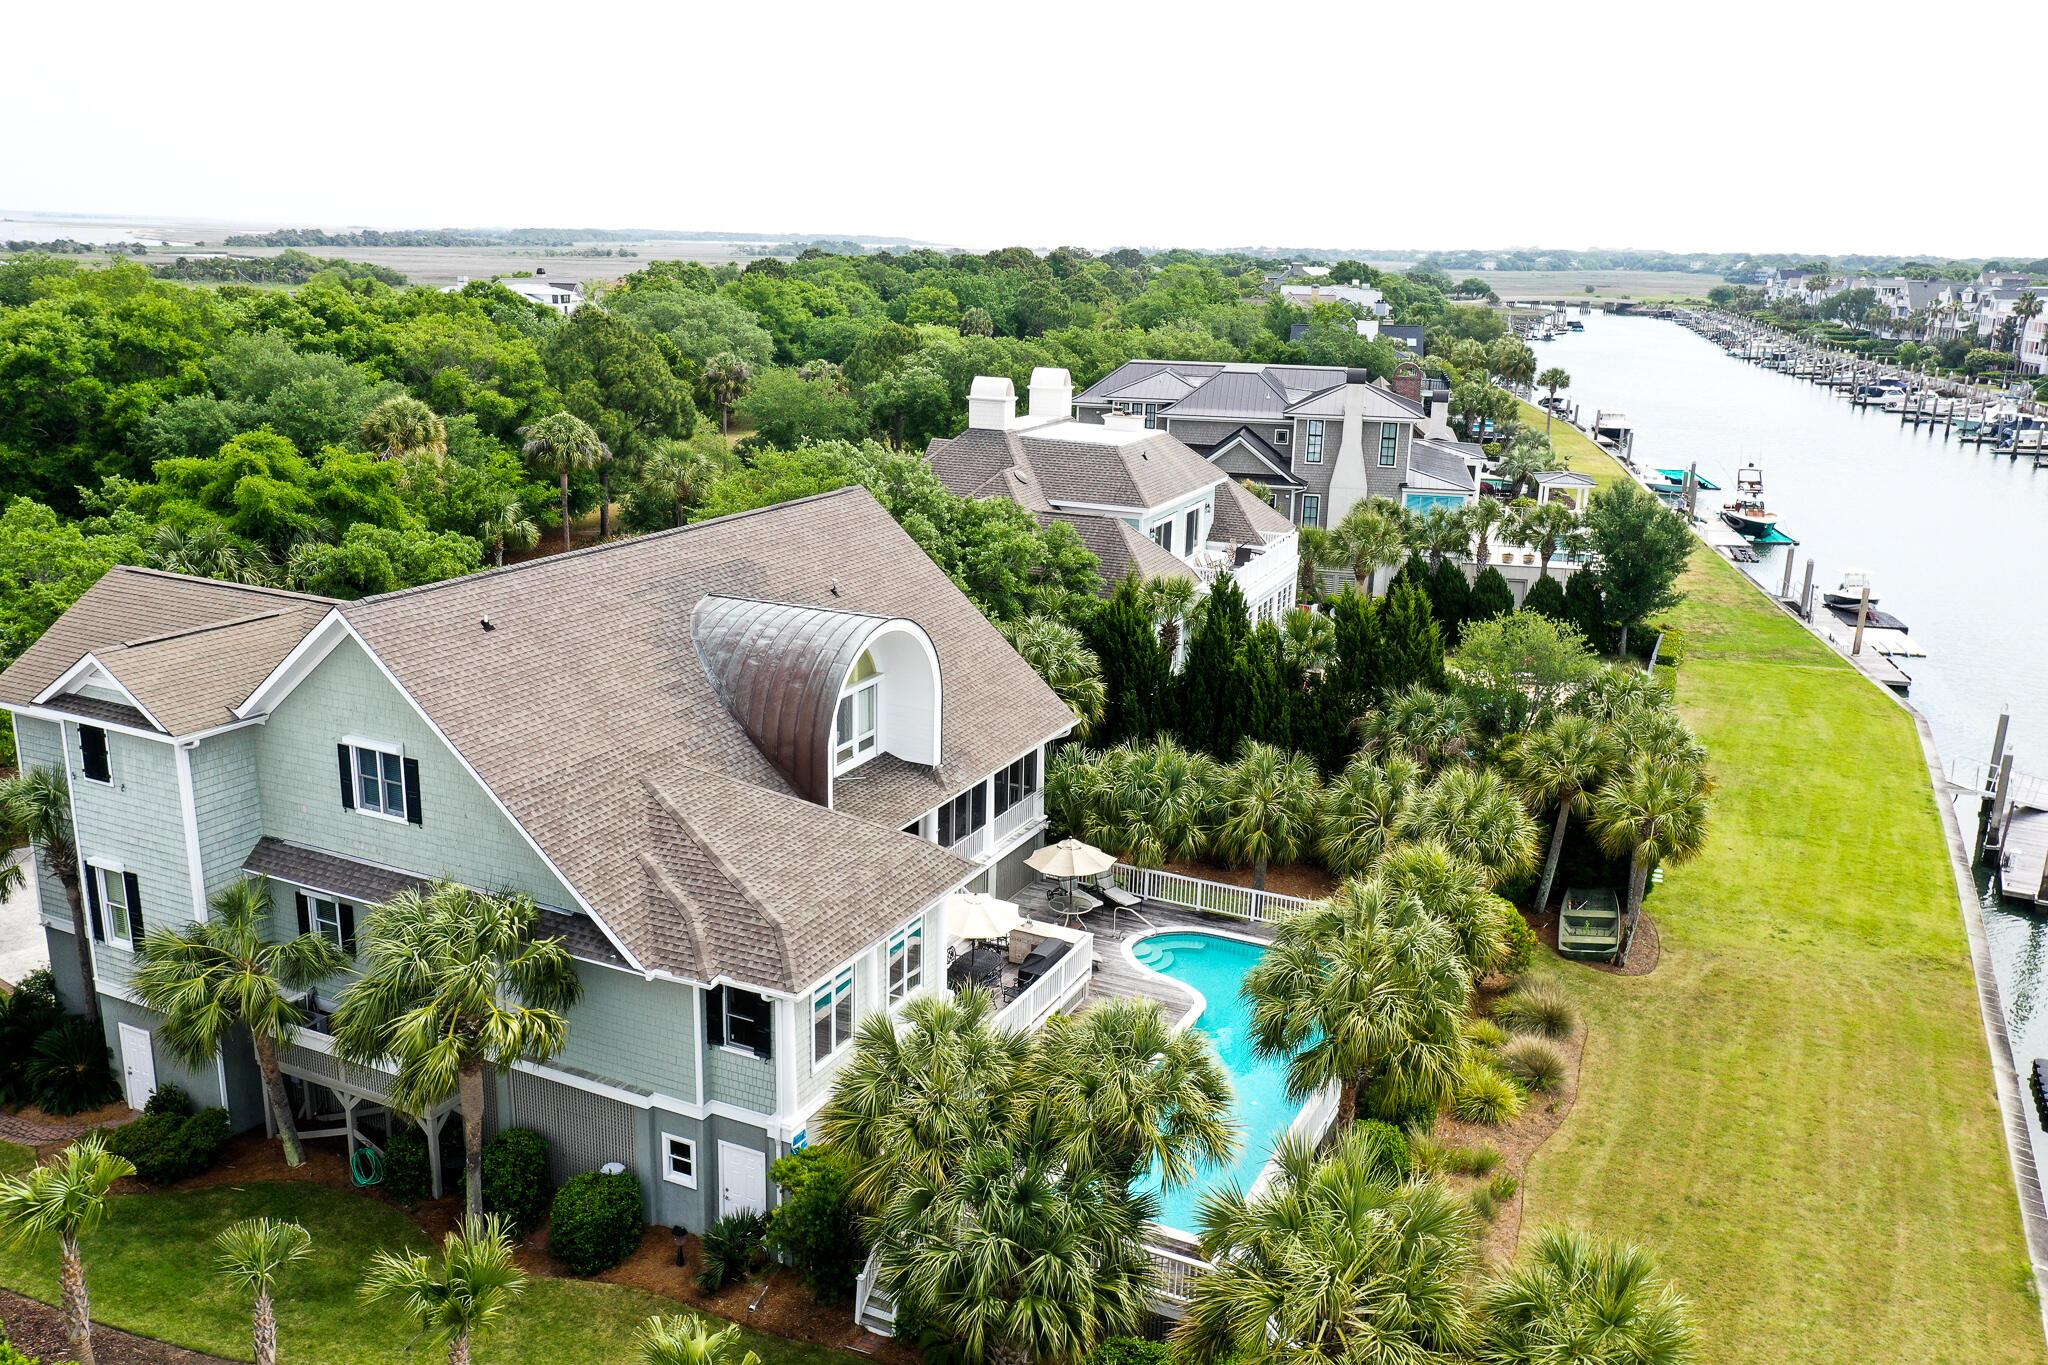 Waterway Island Homes For Sale - 42 Waterway Island Drive, Isle of Palms, SC - 38